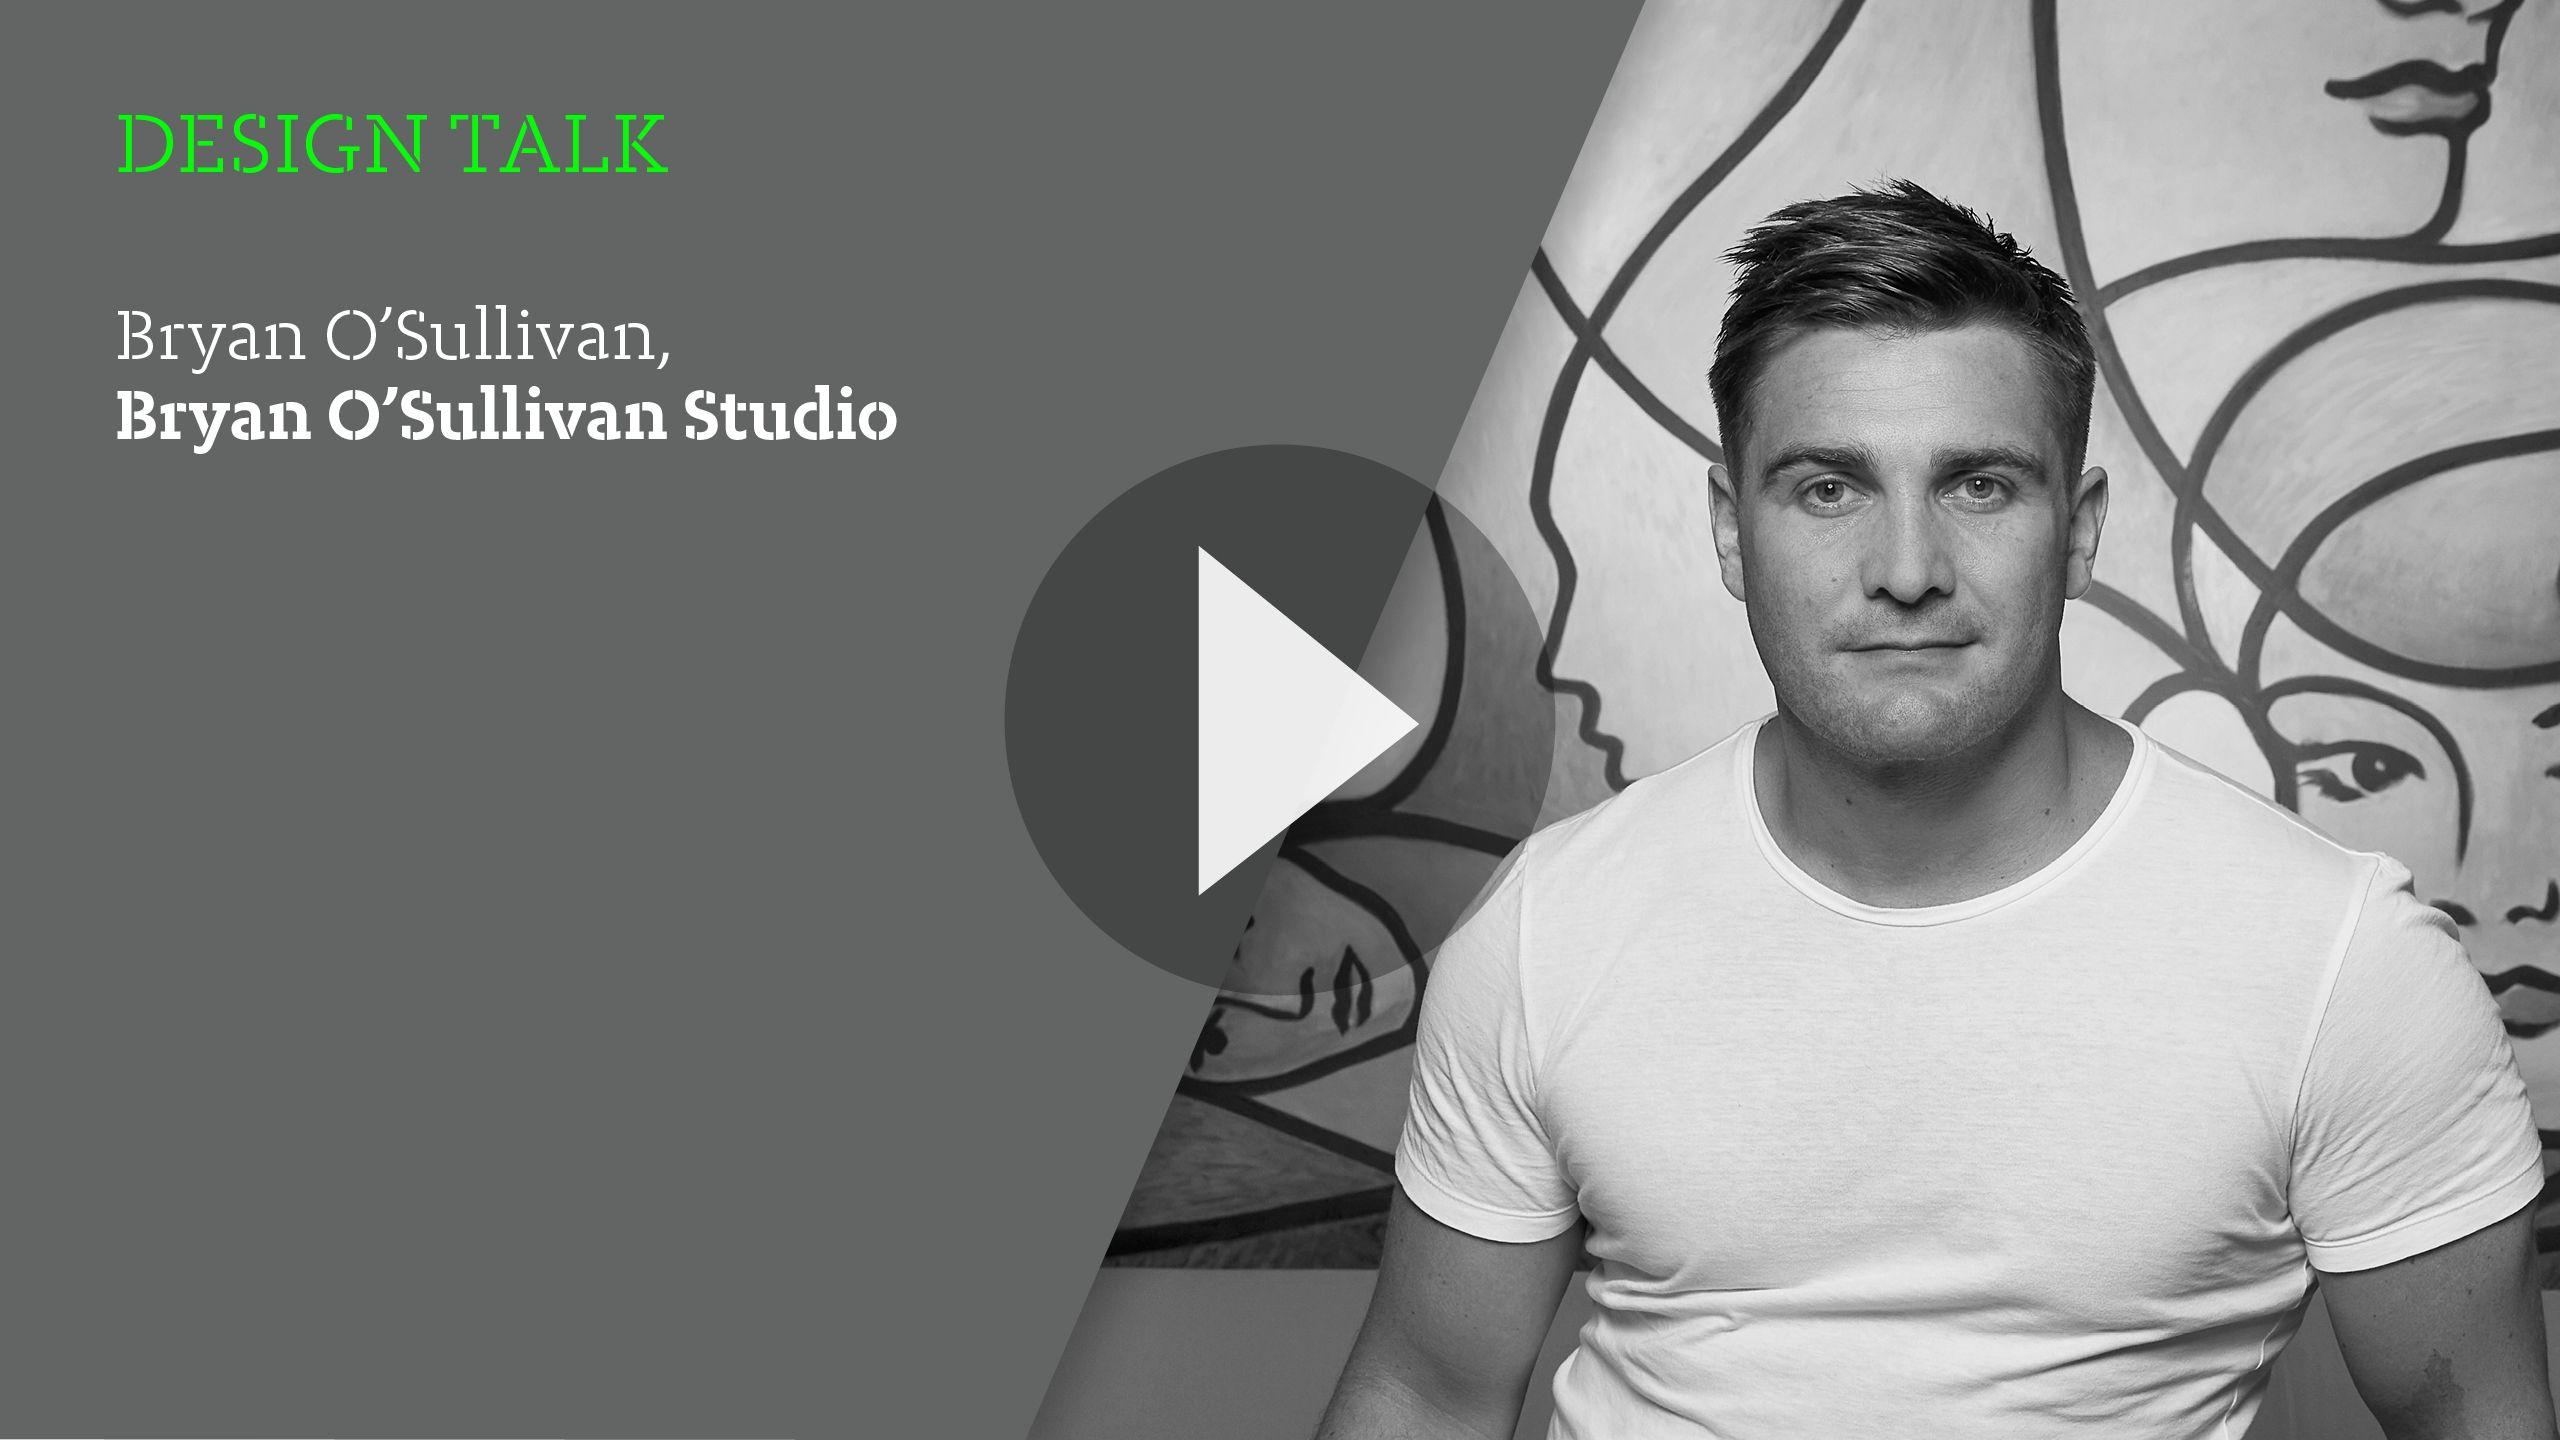 Breaking through: Bryan O'Sullivan